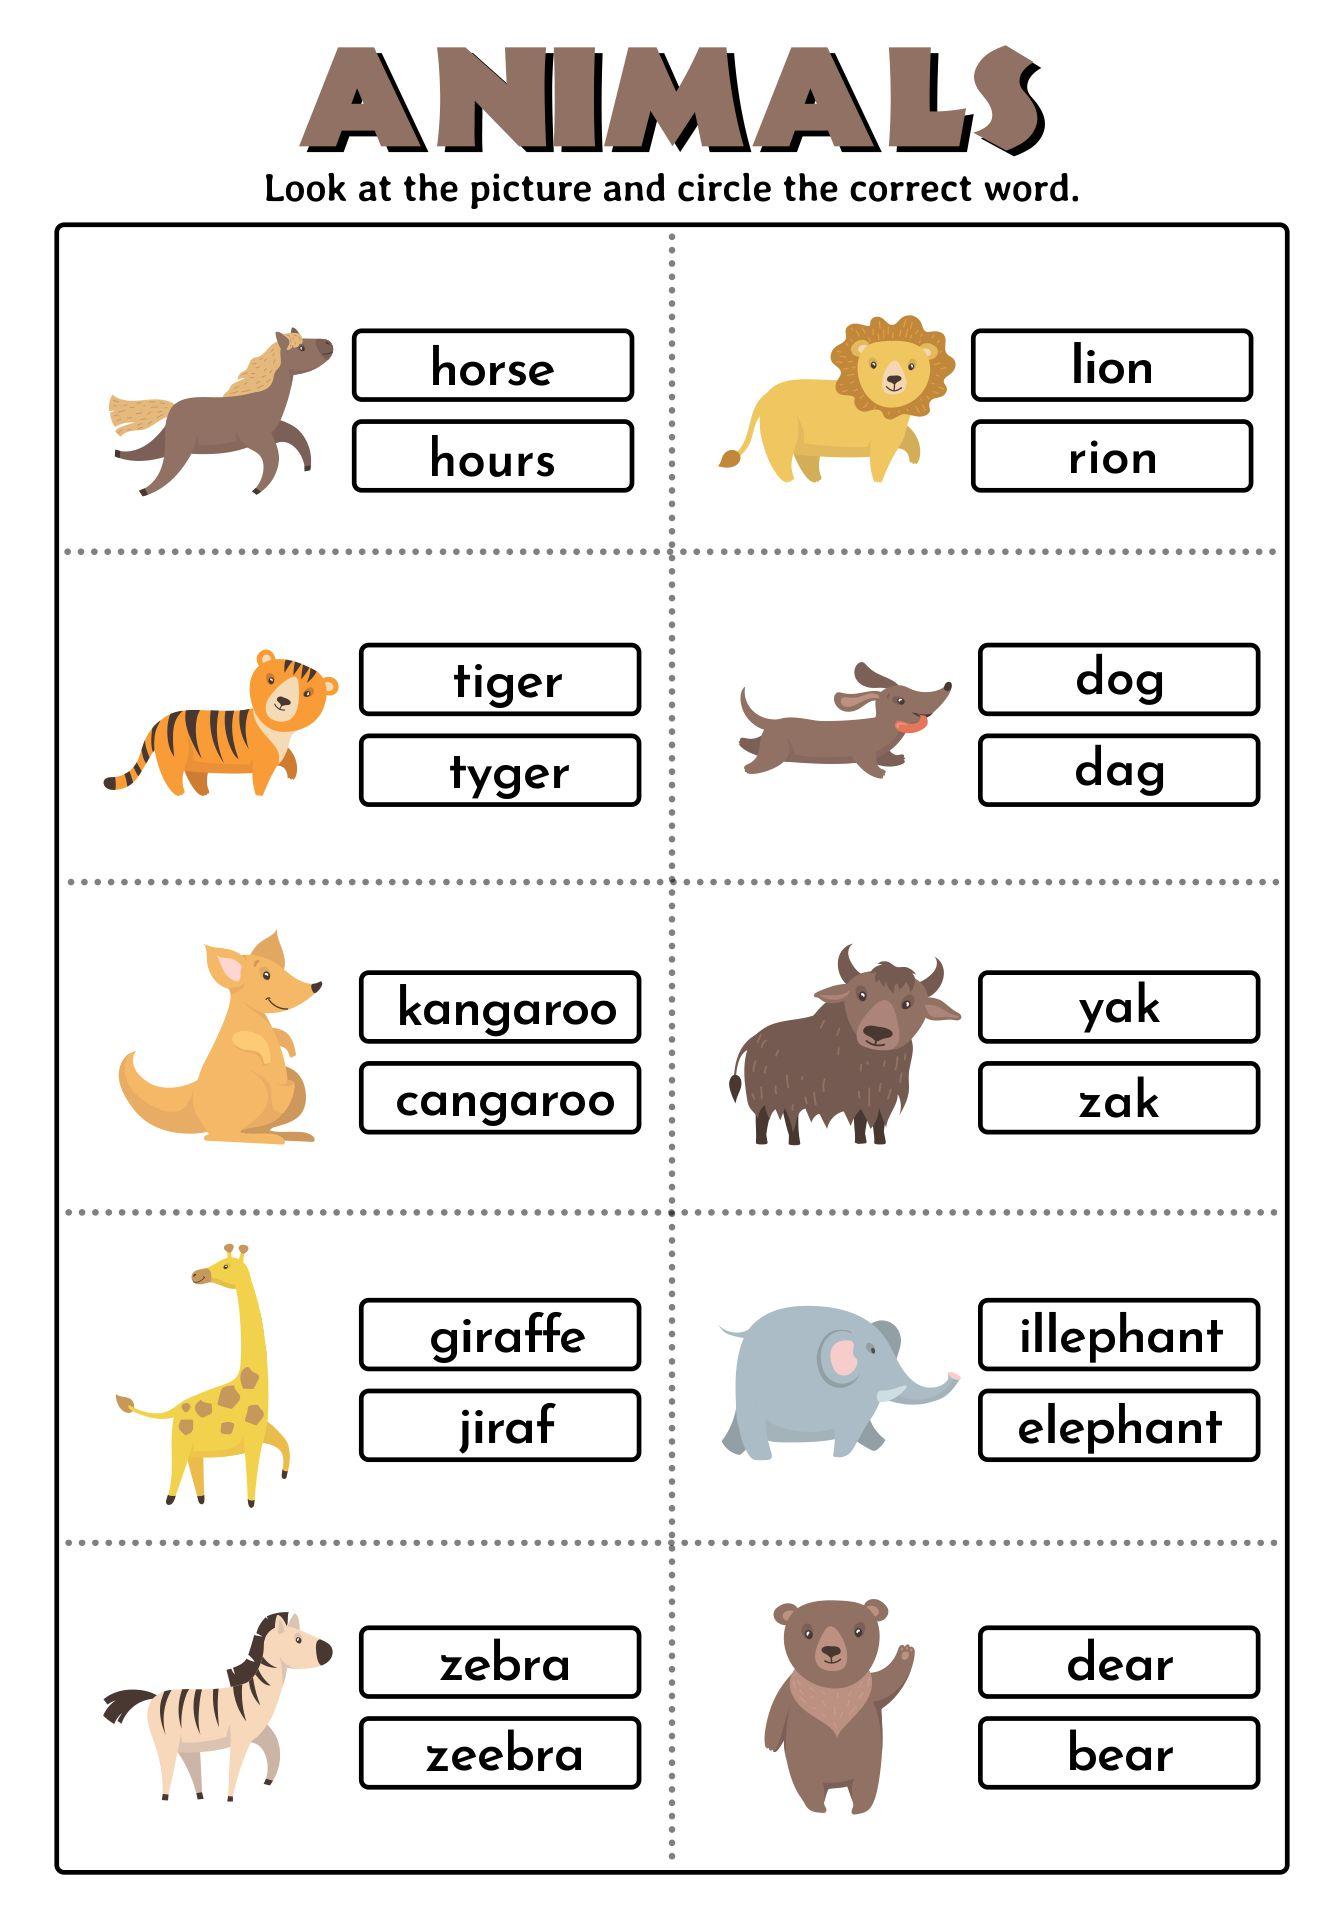 8 Best Images of 3 Year Old Preschool Printables - 4 Year ...